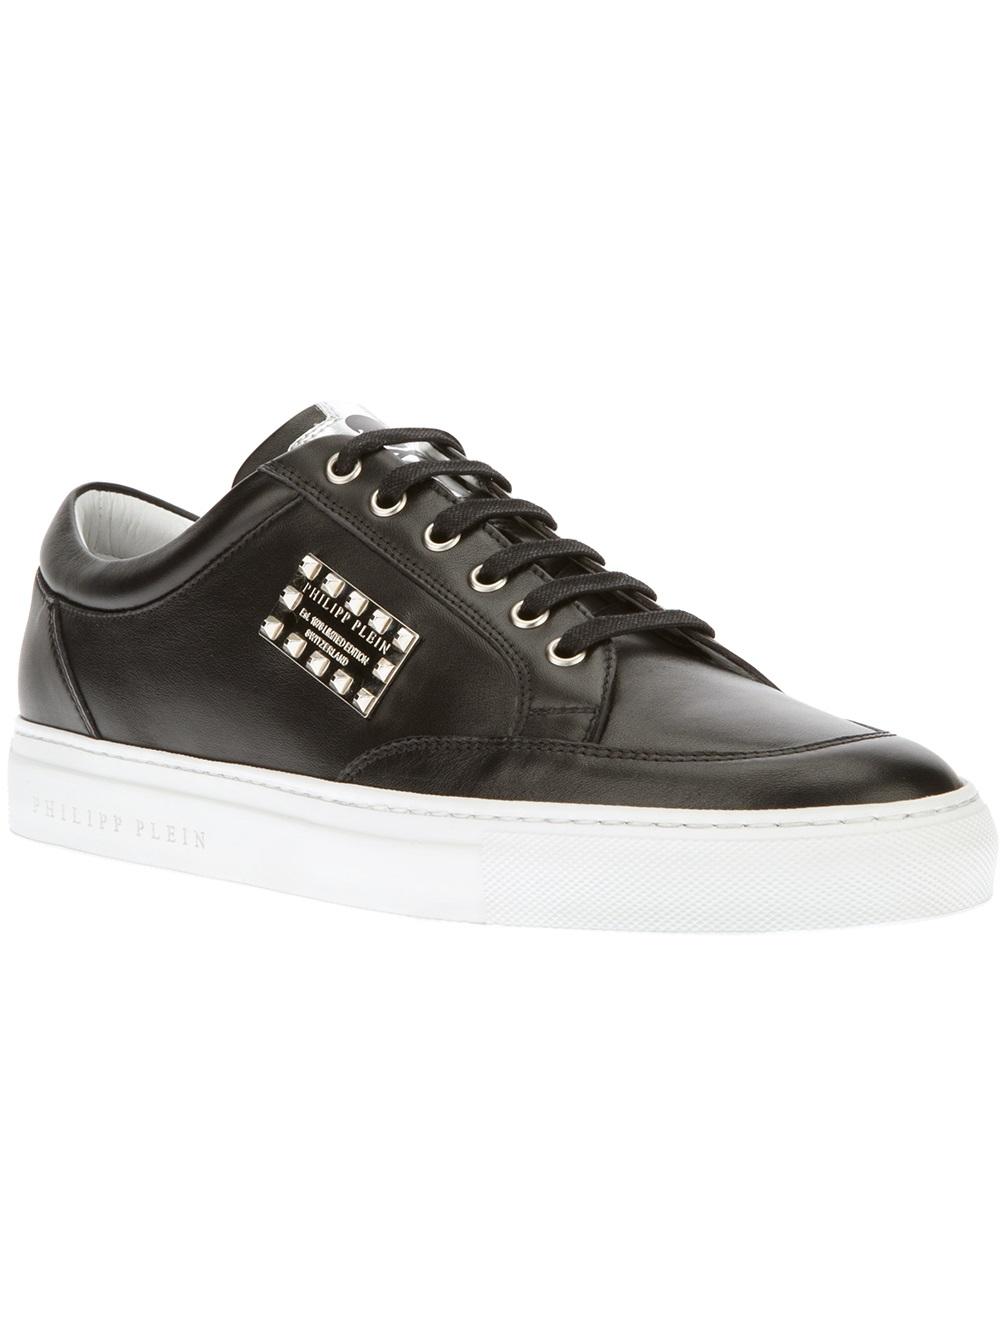 Philipp Plein Shoes Black